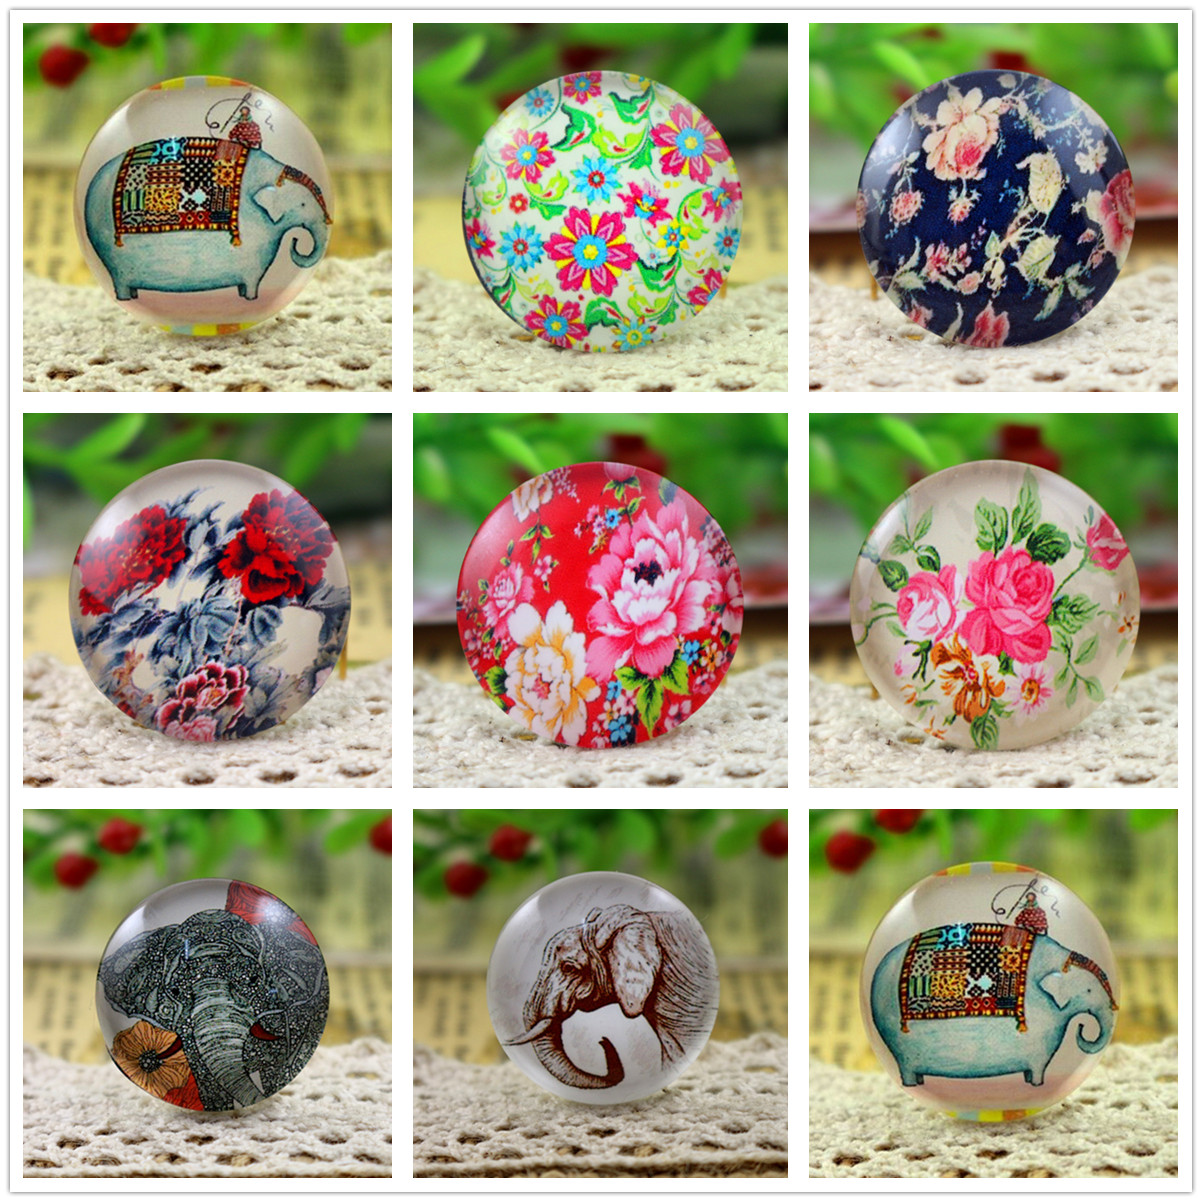 Hot Sale 5pcs/Lot 25mm Handmade Photo Glass Cabochons (Elephant And Flower Series)